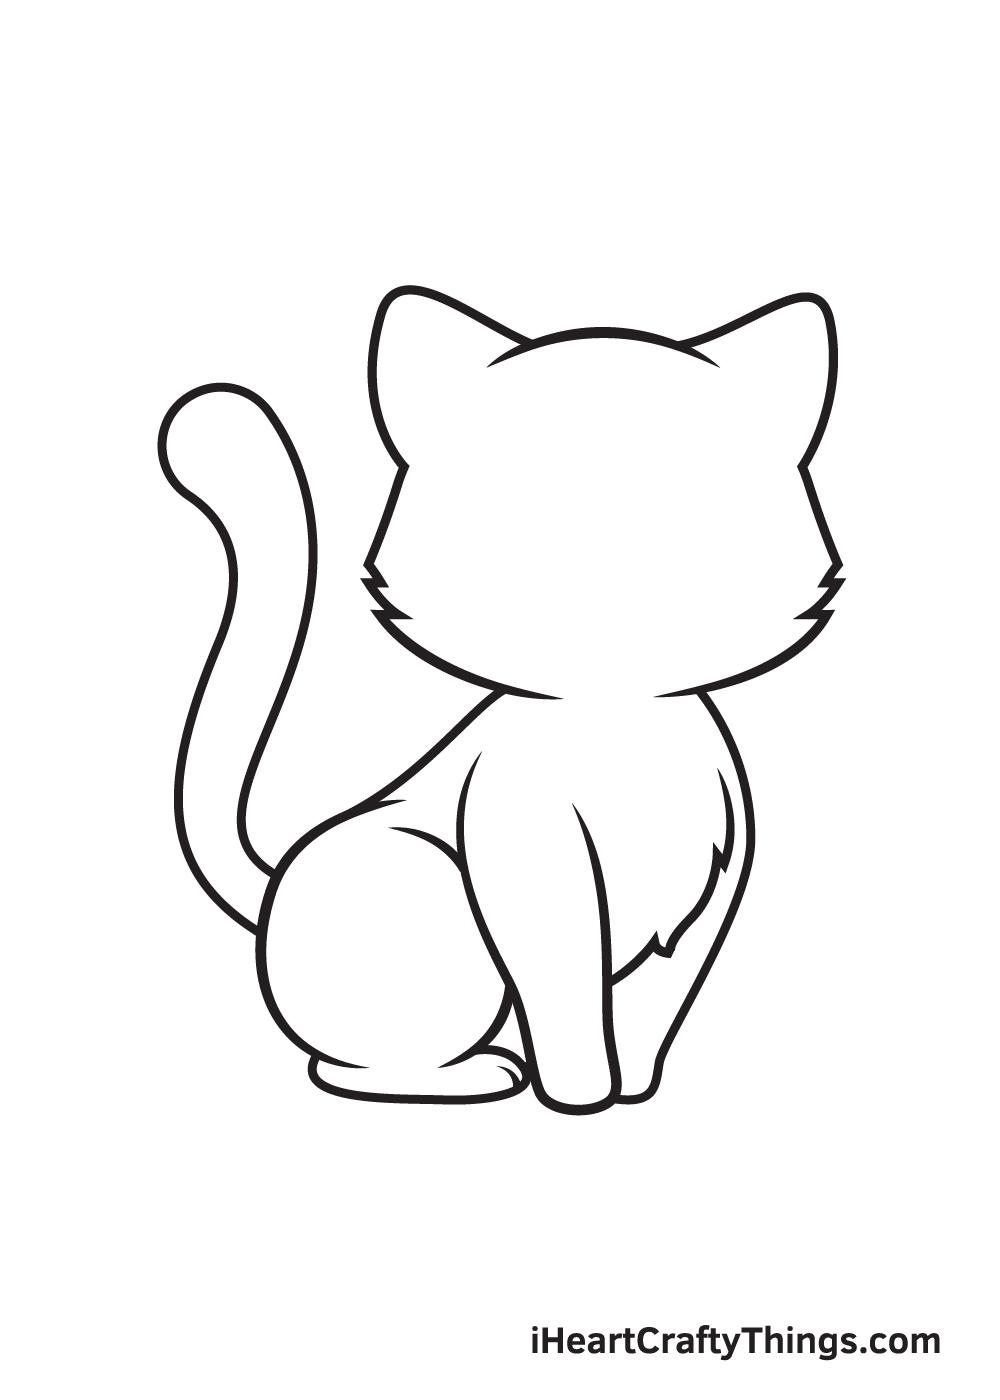 Kitten Drawing – Step 6